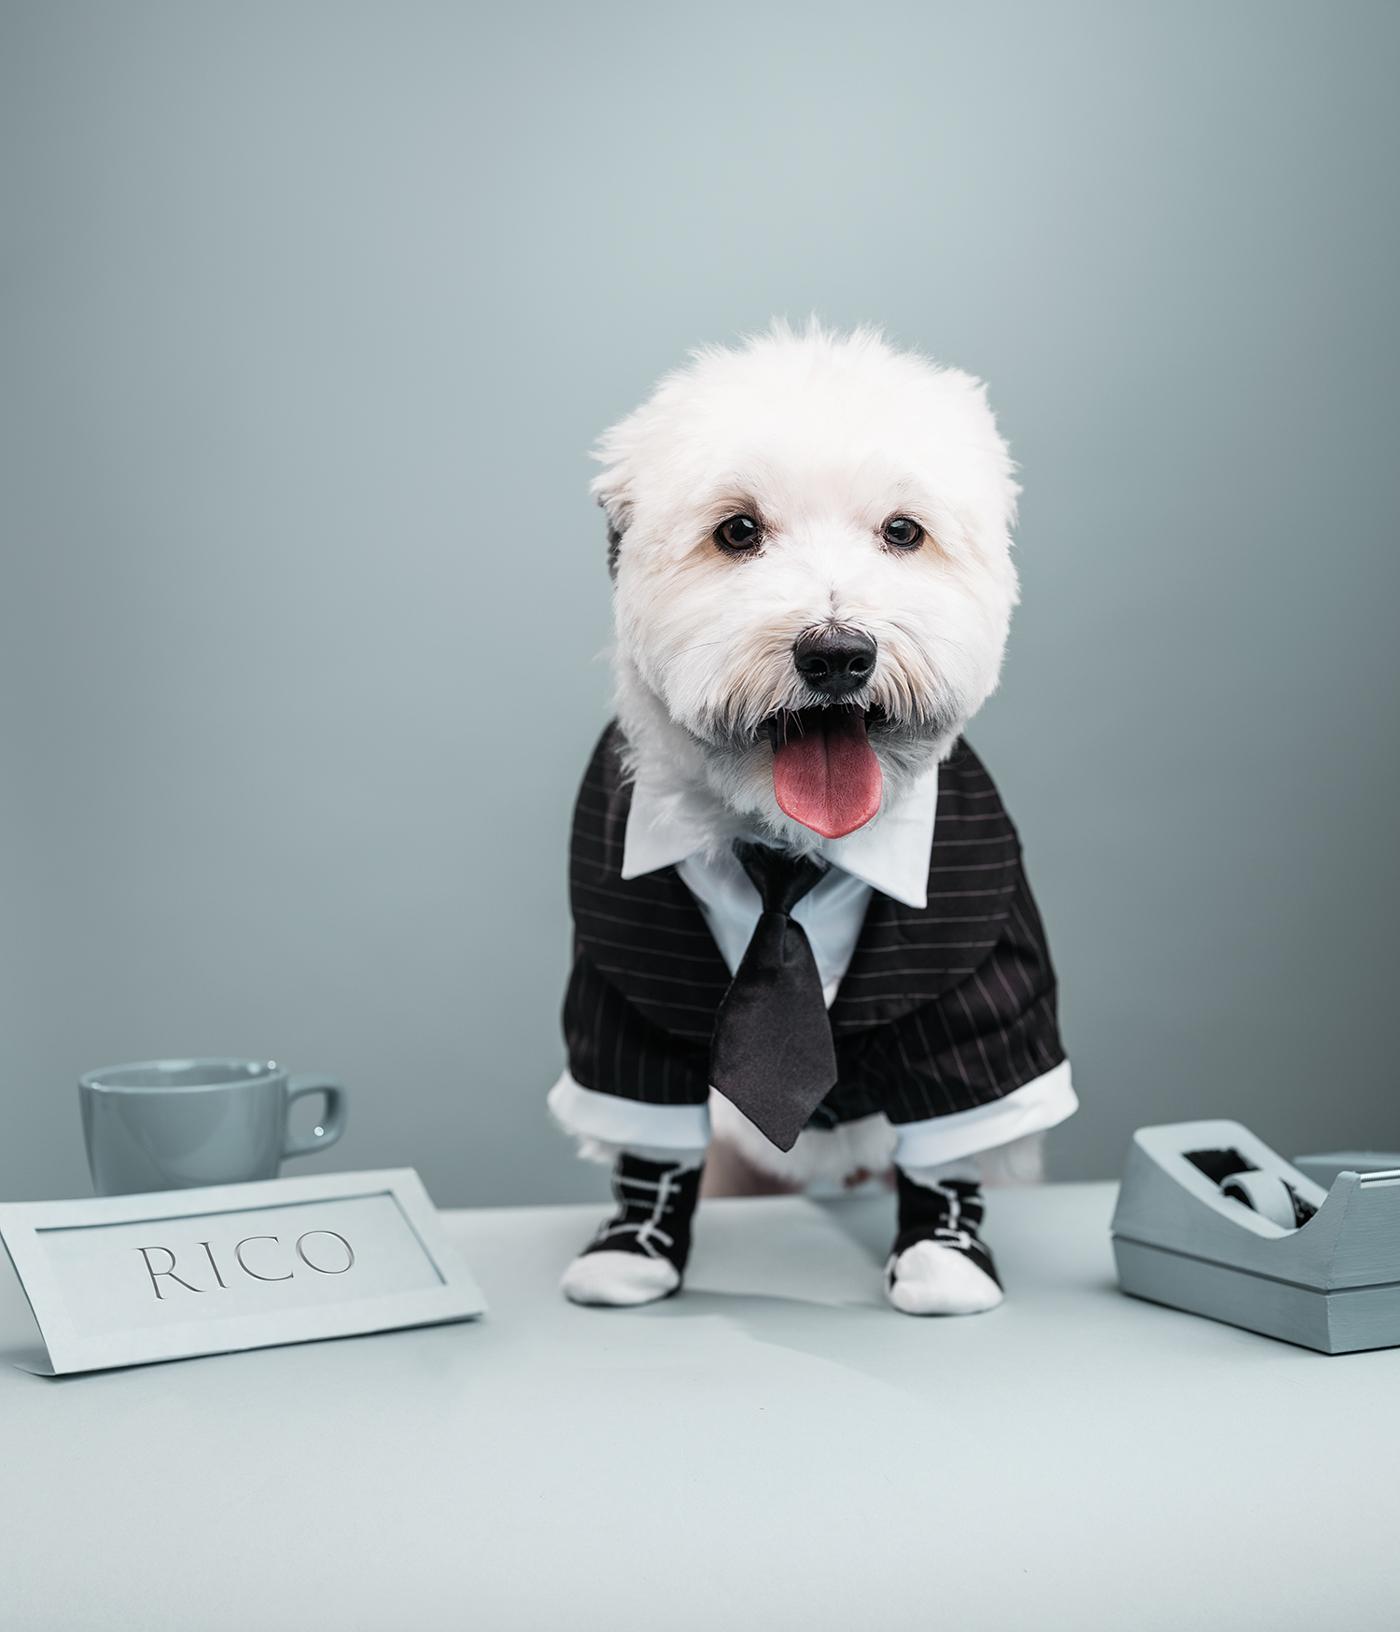 Dogs_Rico.jpg